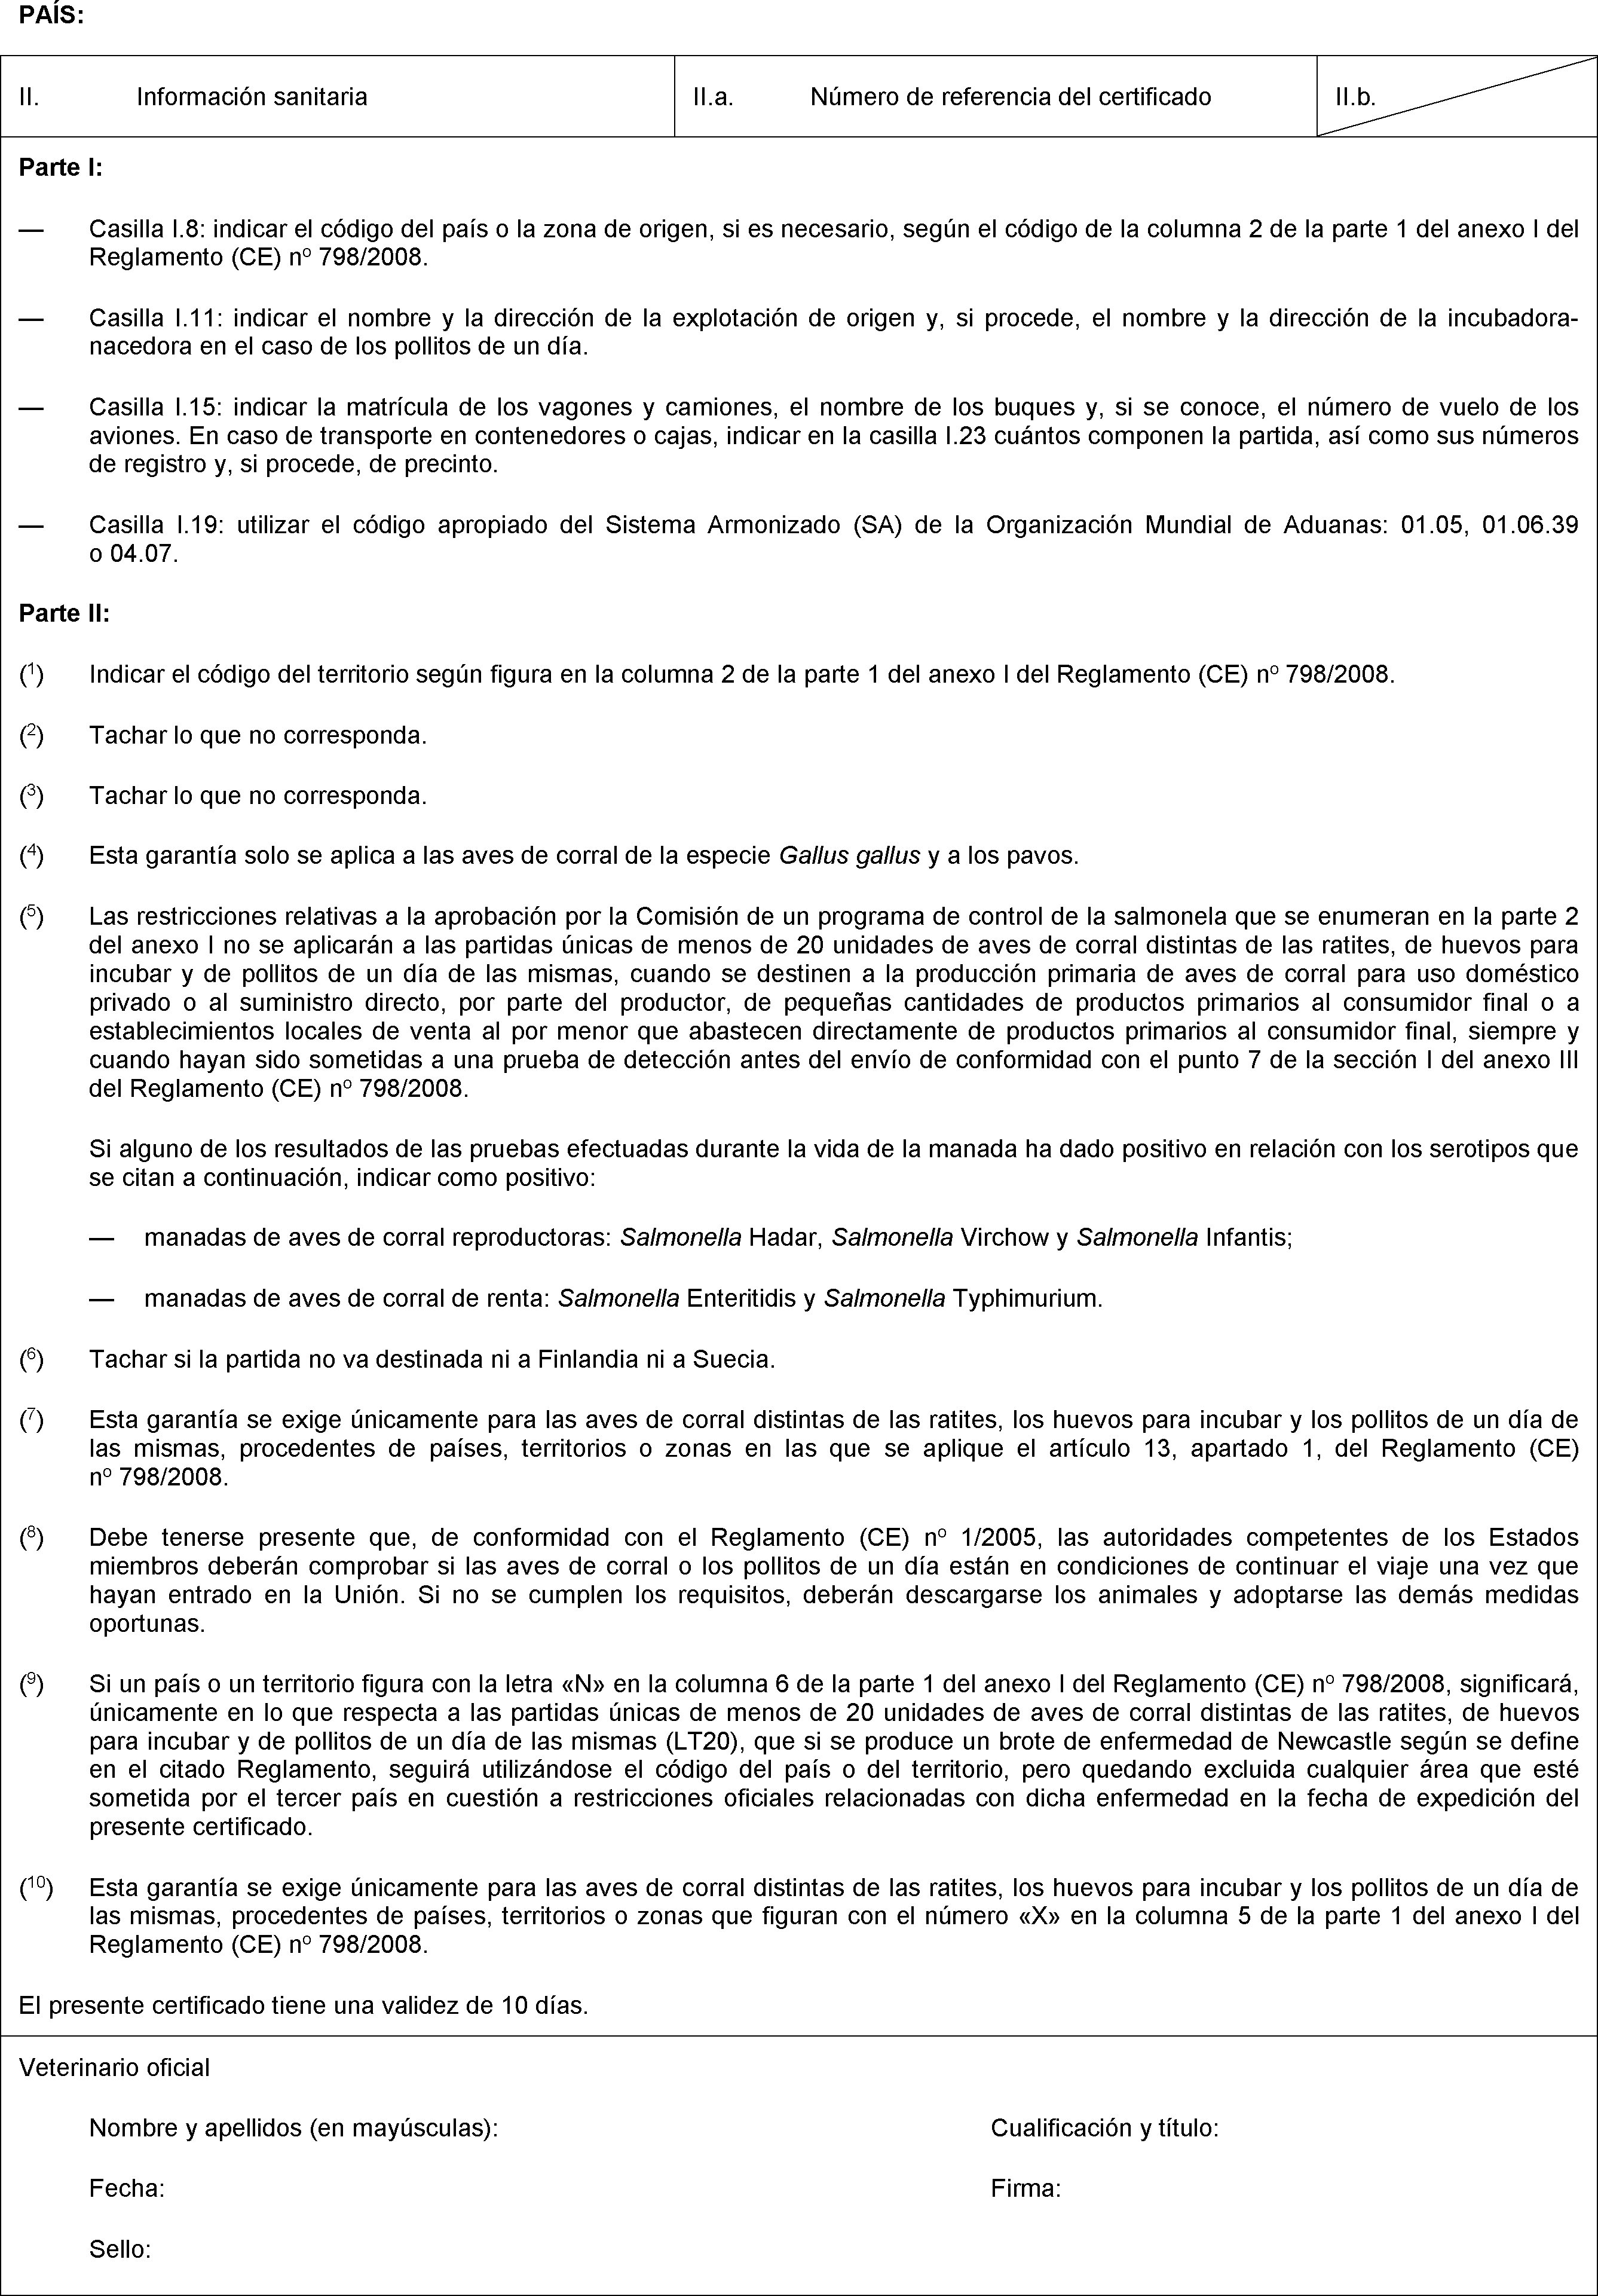 EUR-Lex - 02008R0798-20170207 - EN - EUR-Lex